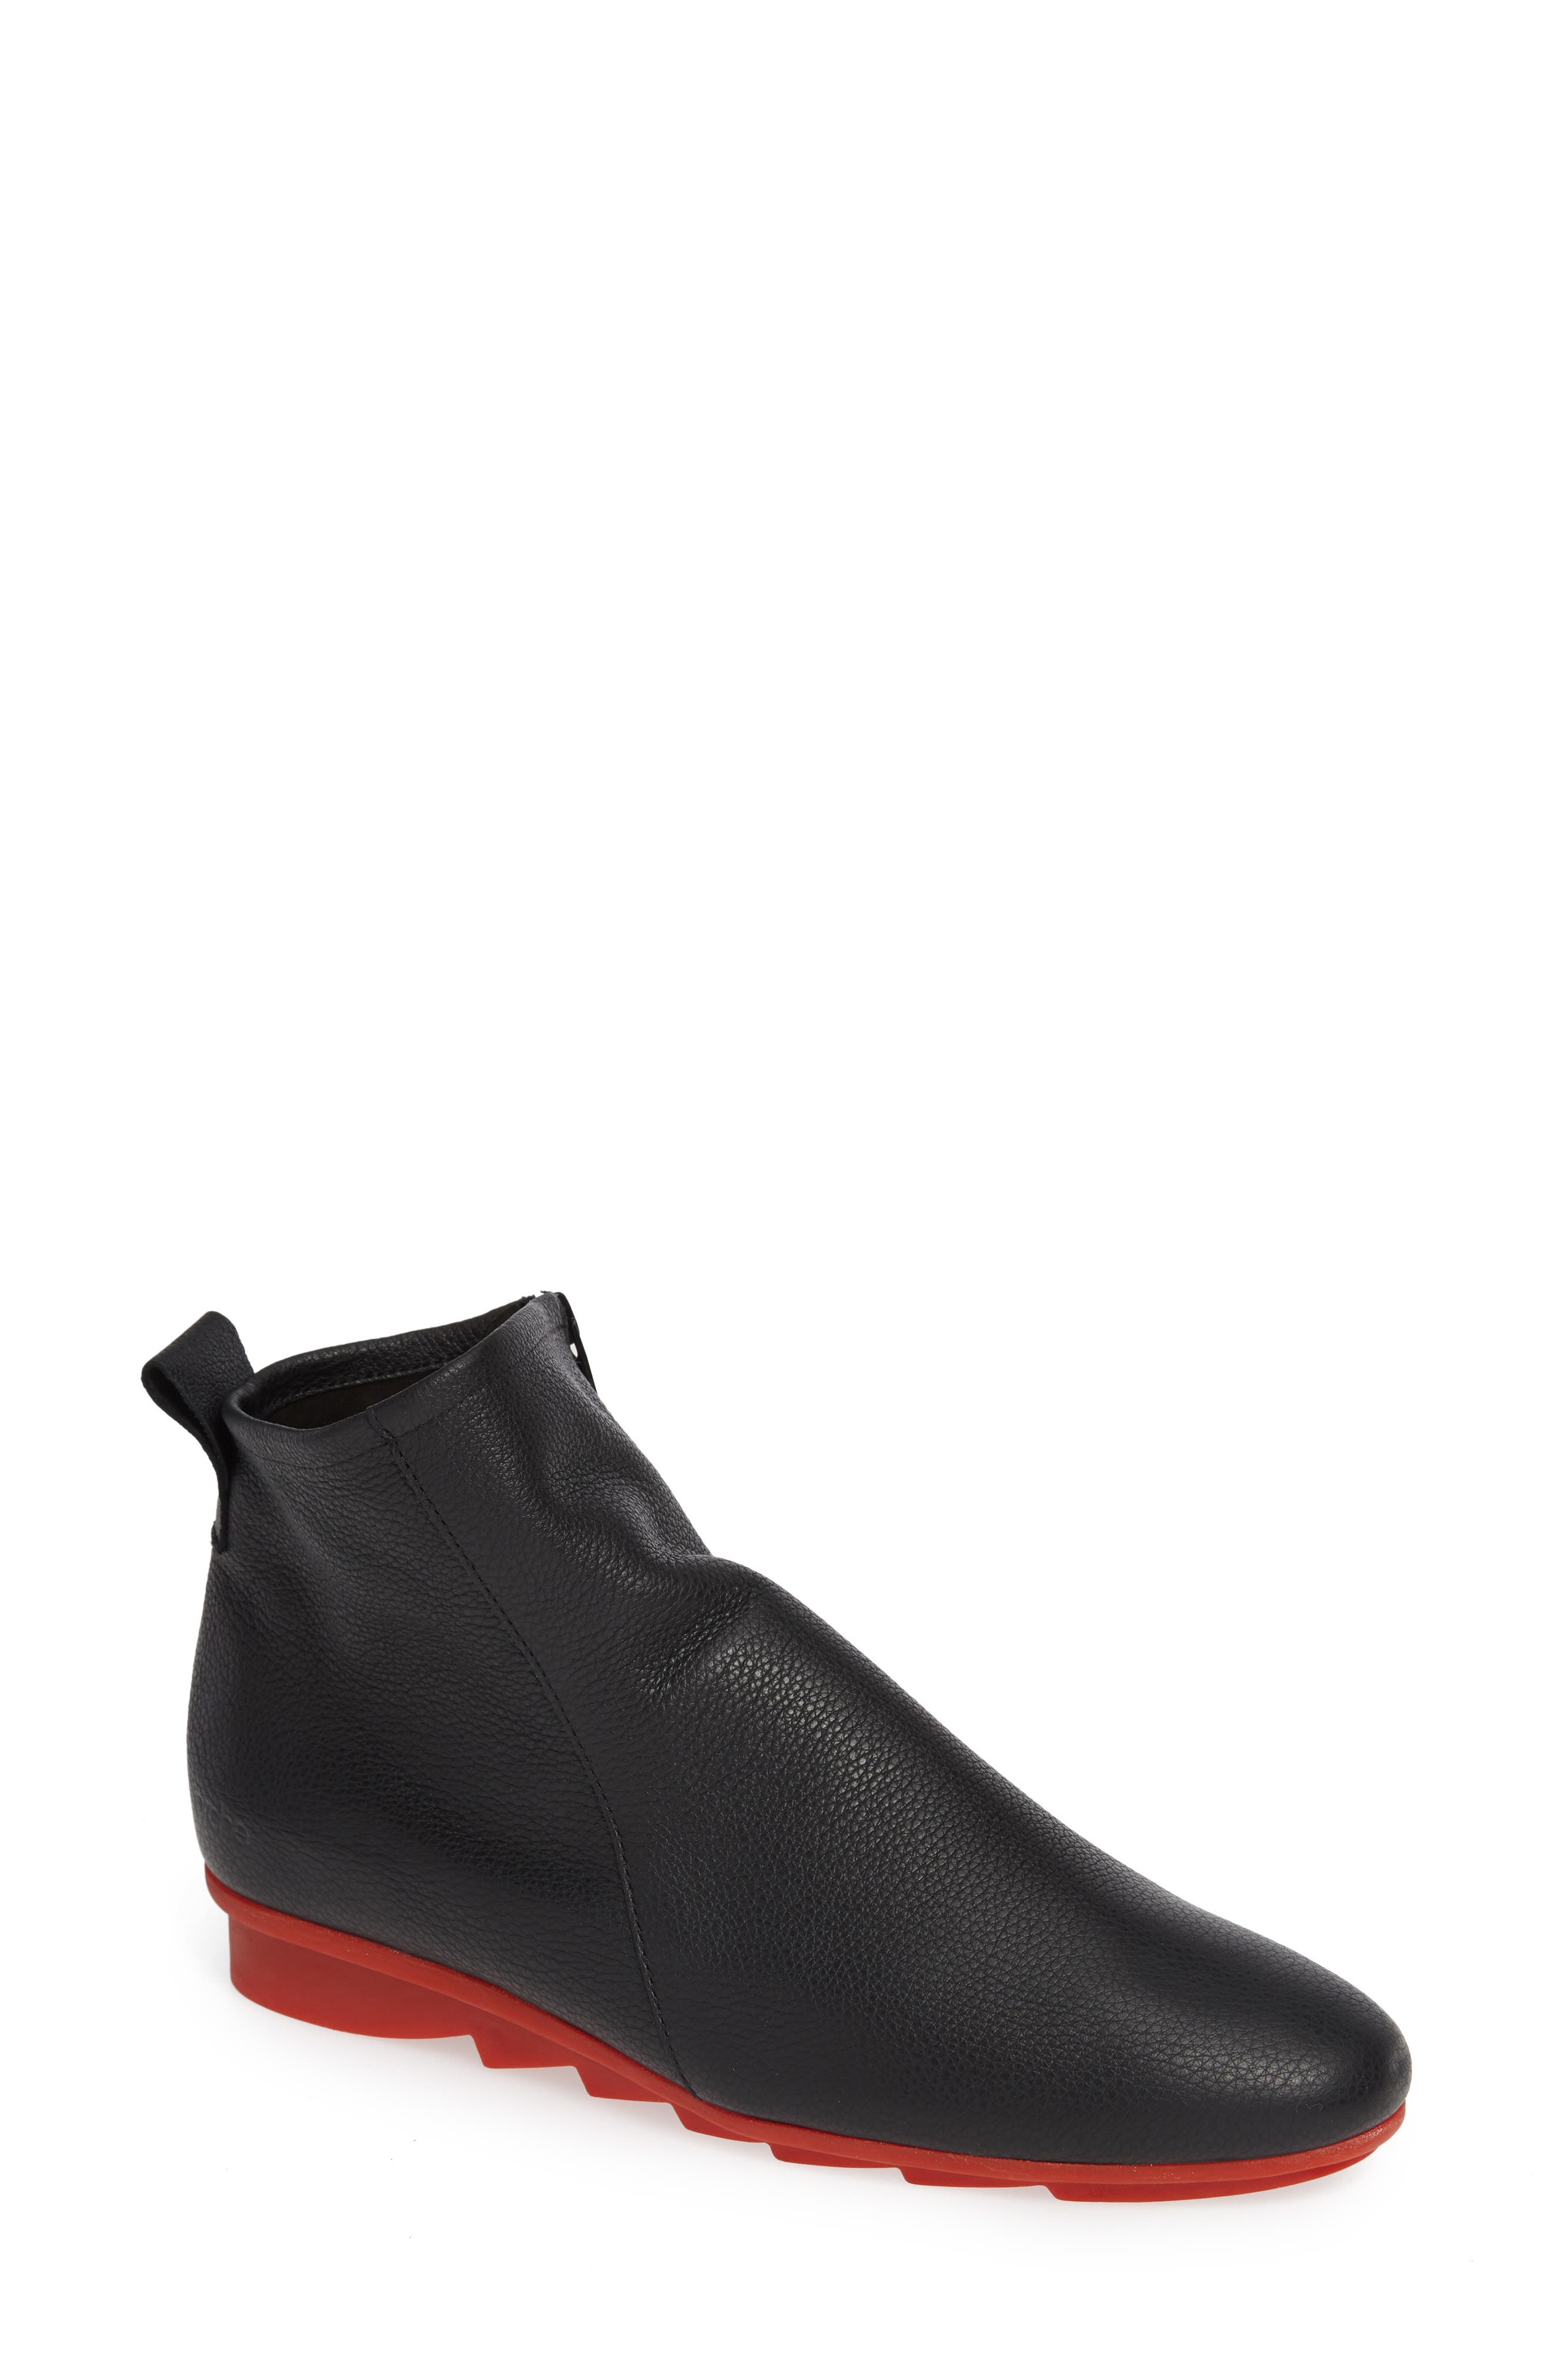 ARCHE Bibiki Water Resistant Bootie in Truffe/ Micas Nubuck Leather